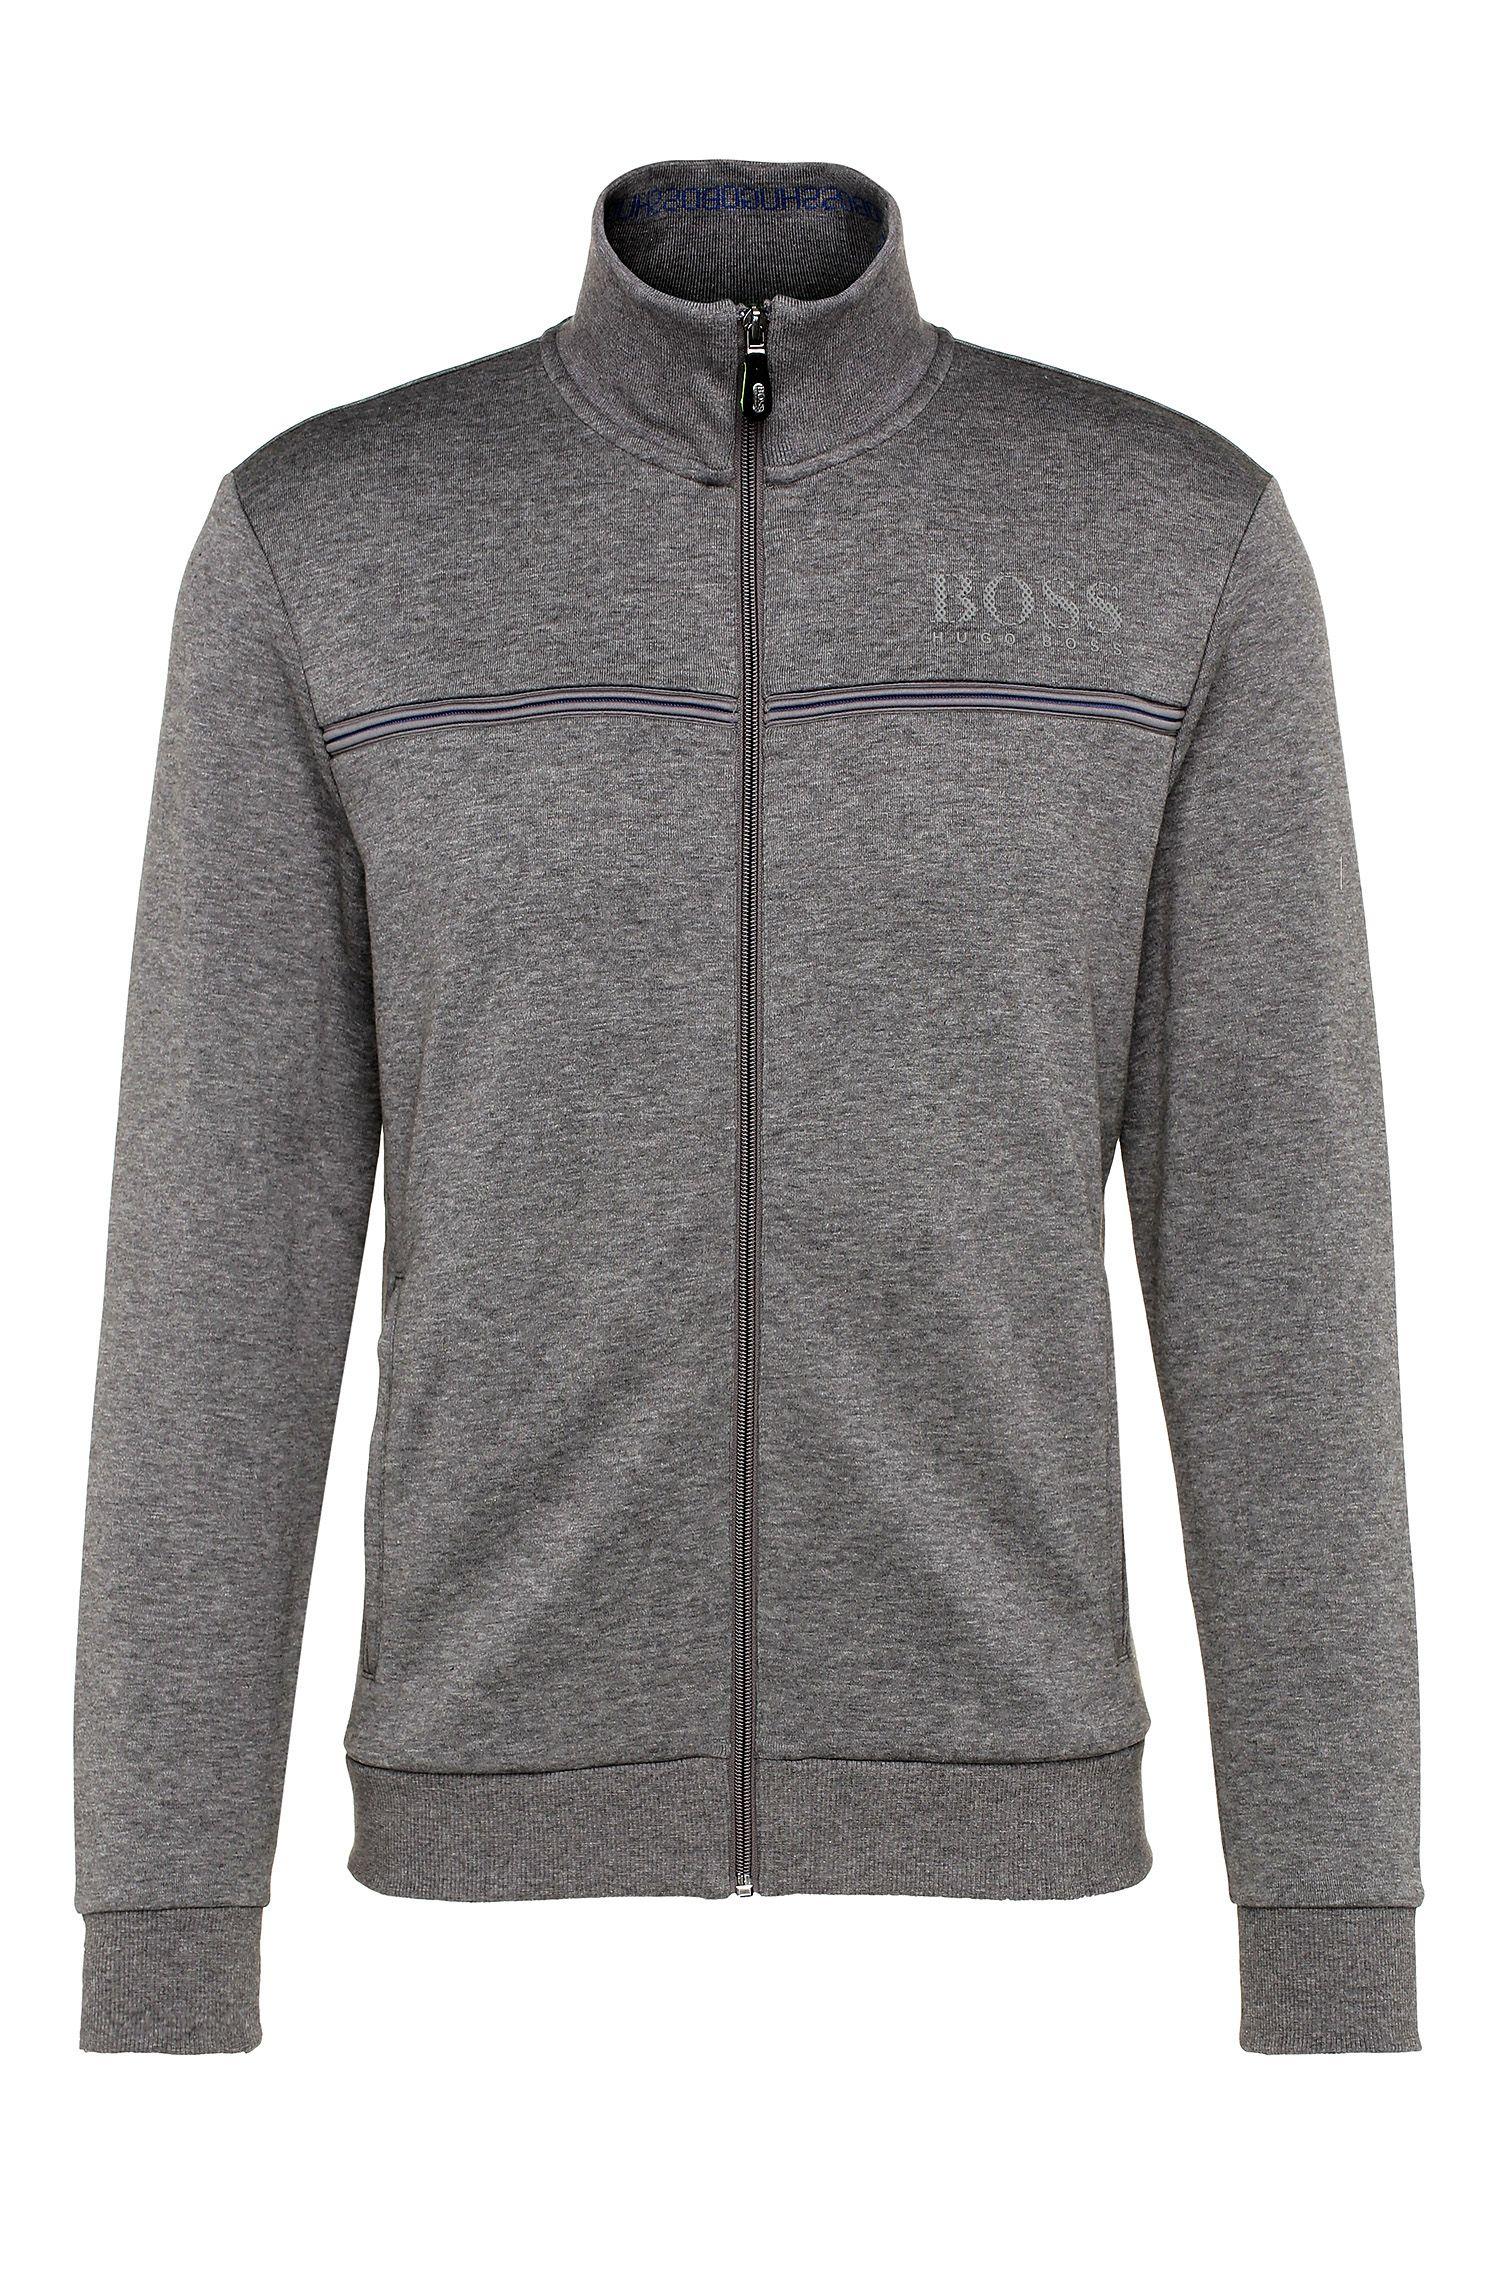 'Skaz' | Stretch Nylon Sweat Jacket